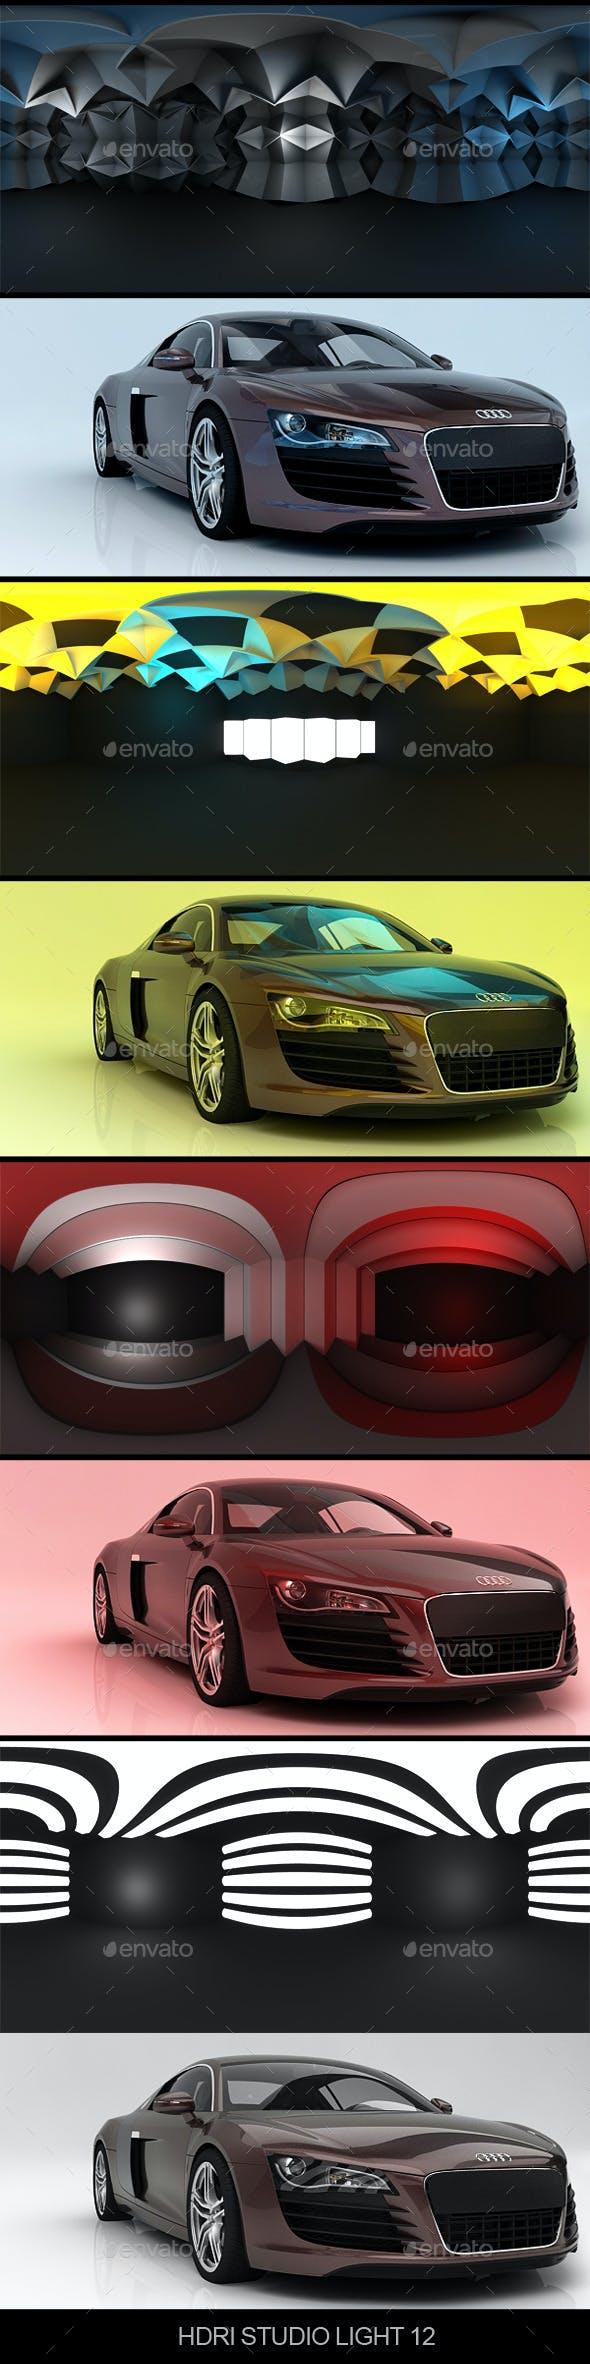 Studio light 12 - 3DOcean Item for Sale